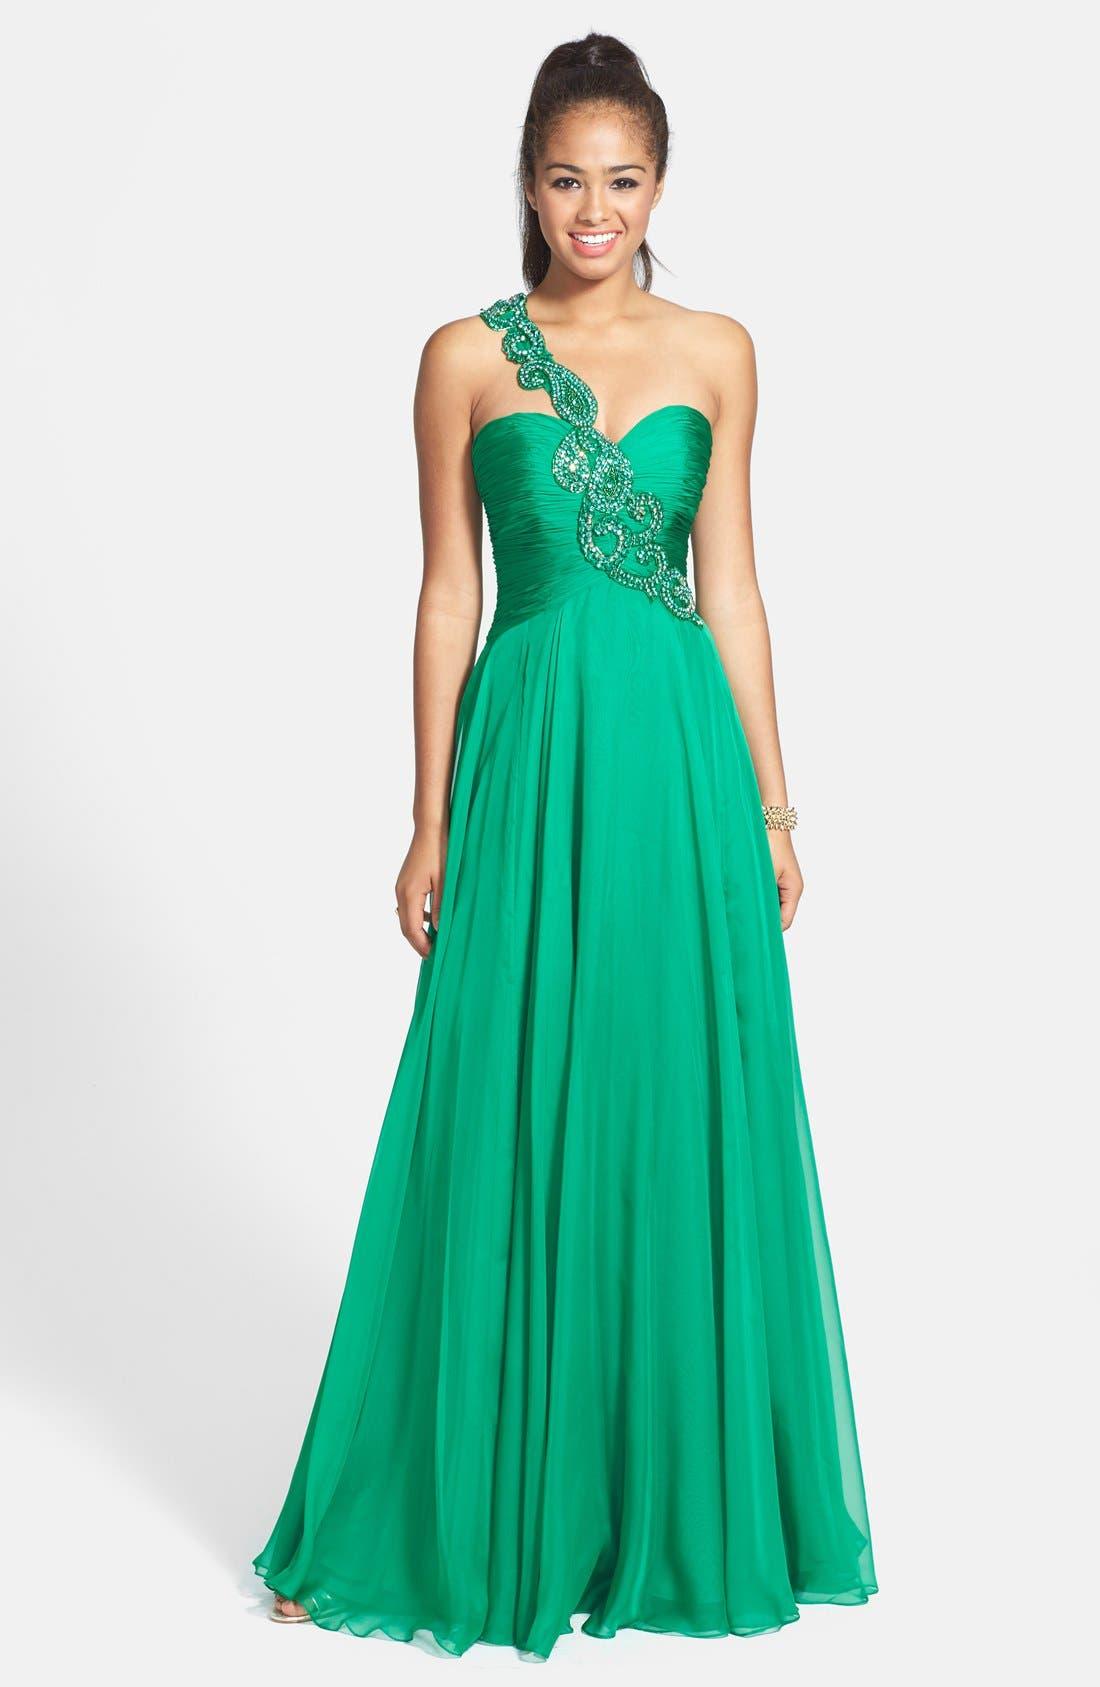 Alternate Image 1 Selected - Sherri Hill One Shoulder Embellished Chiffon Gown